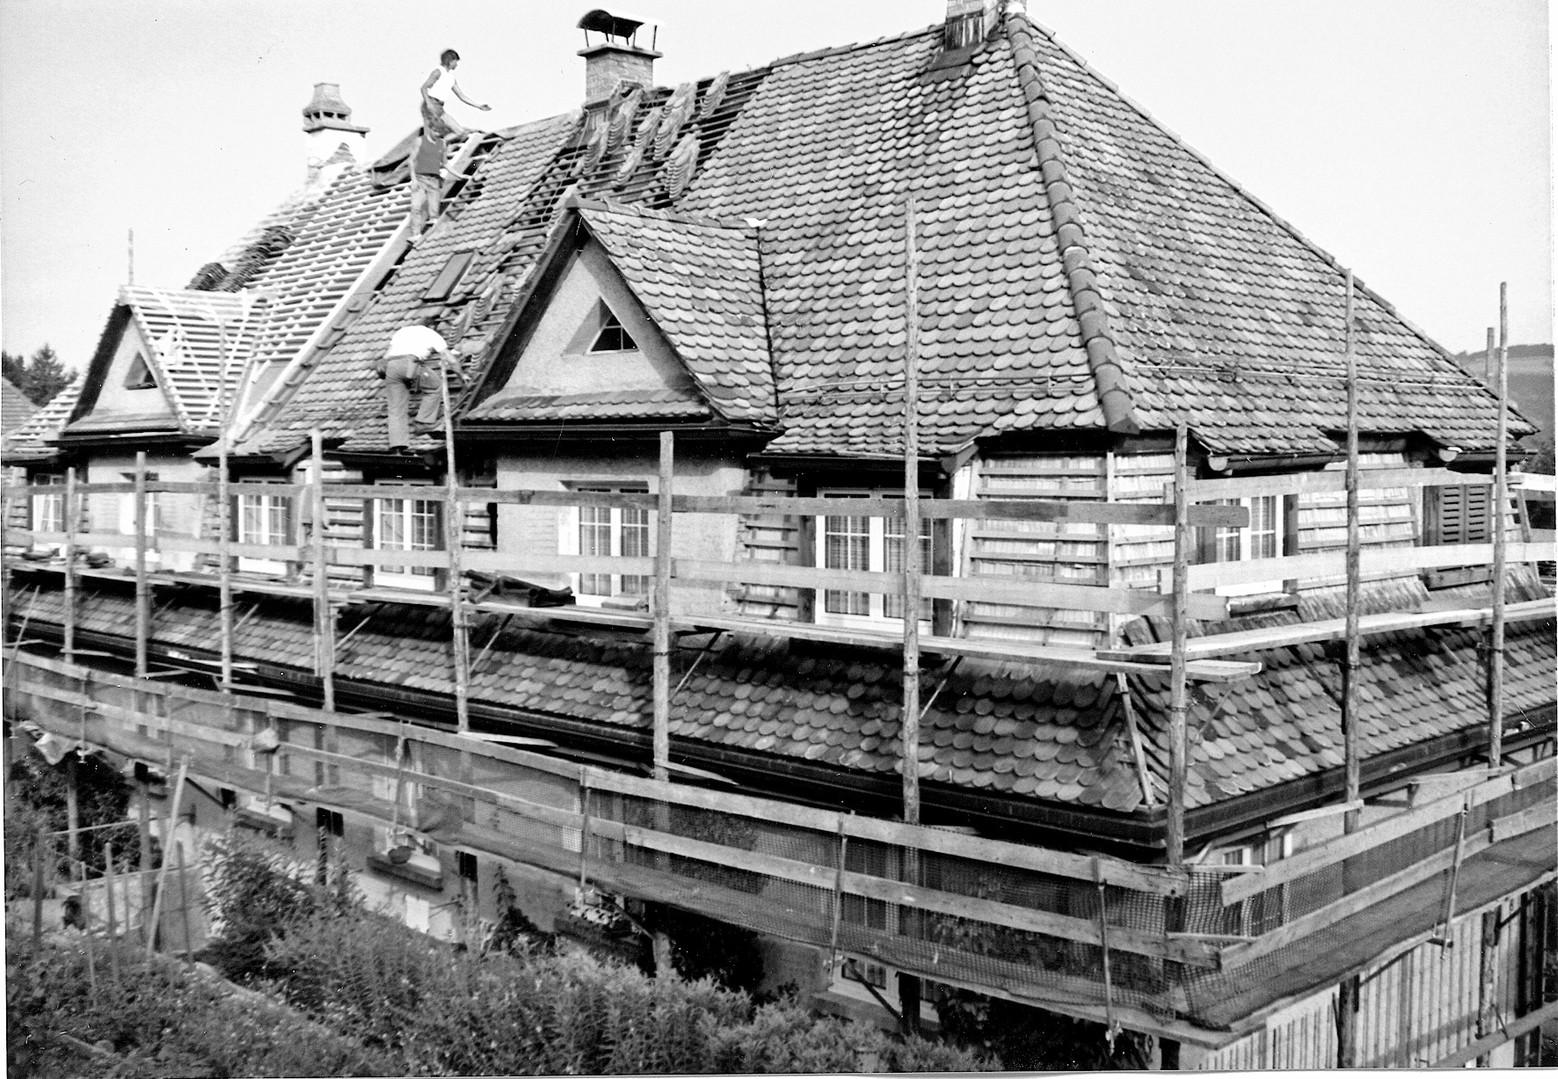 2009 04. 15. Foto EBG St.Gallen. 2009 (F